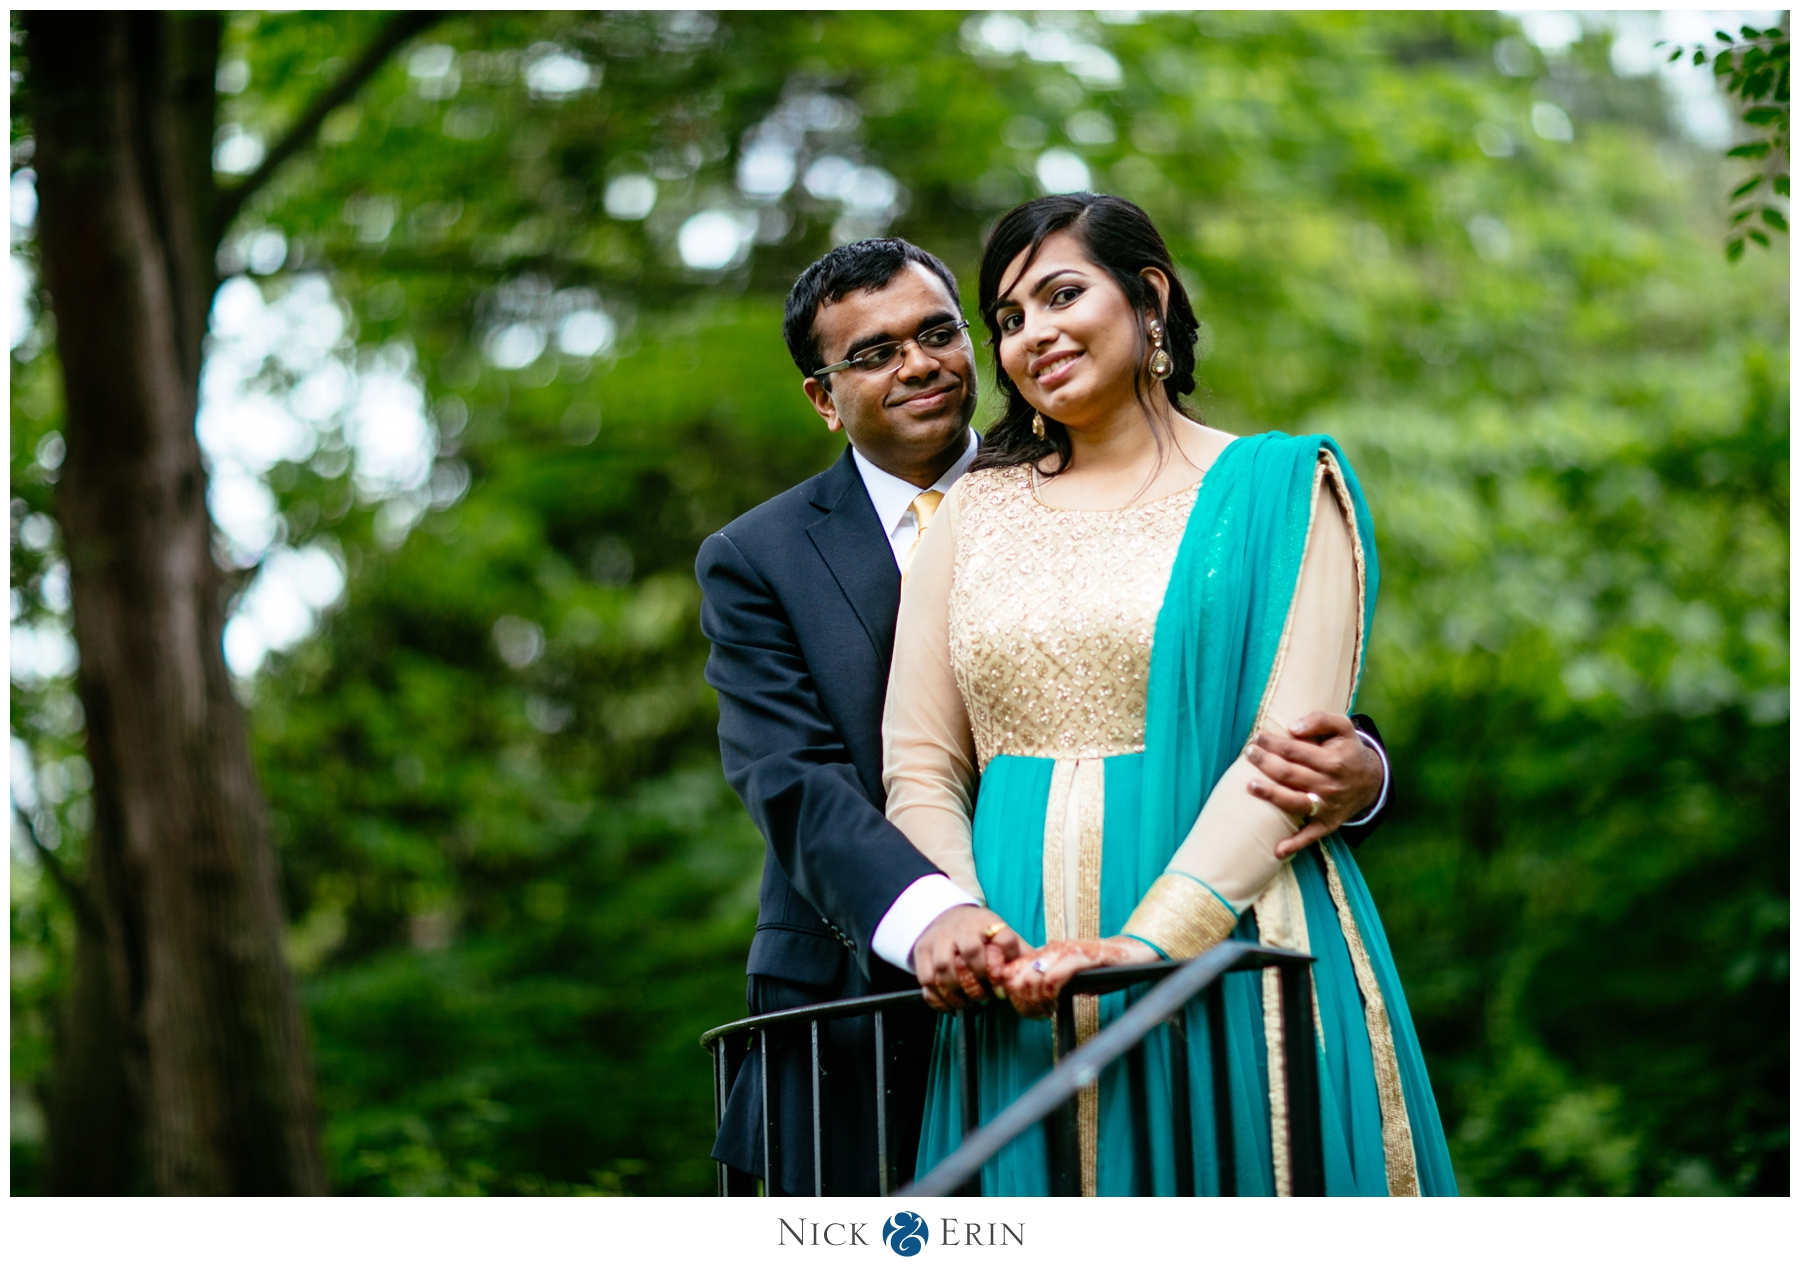 Donner_Photography_Arlington VA Wedding_Amrith and Aleefia_0007